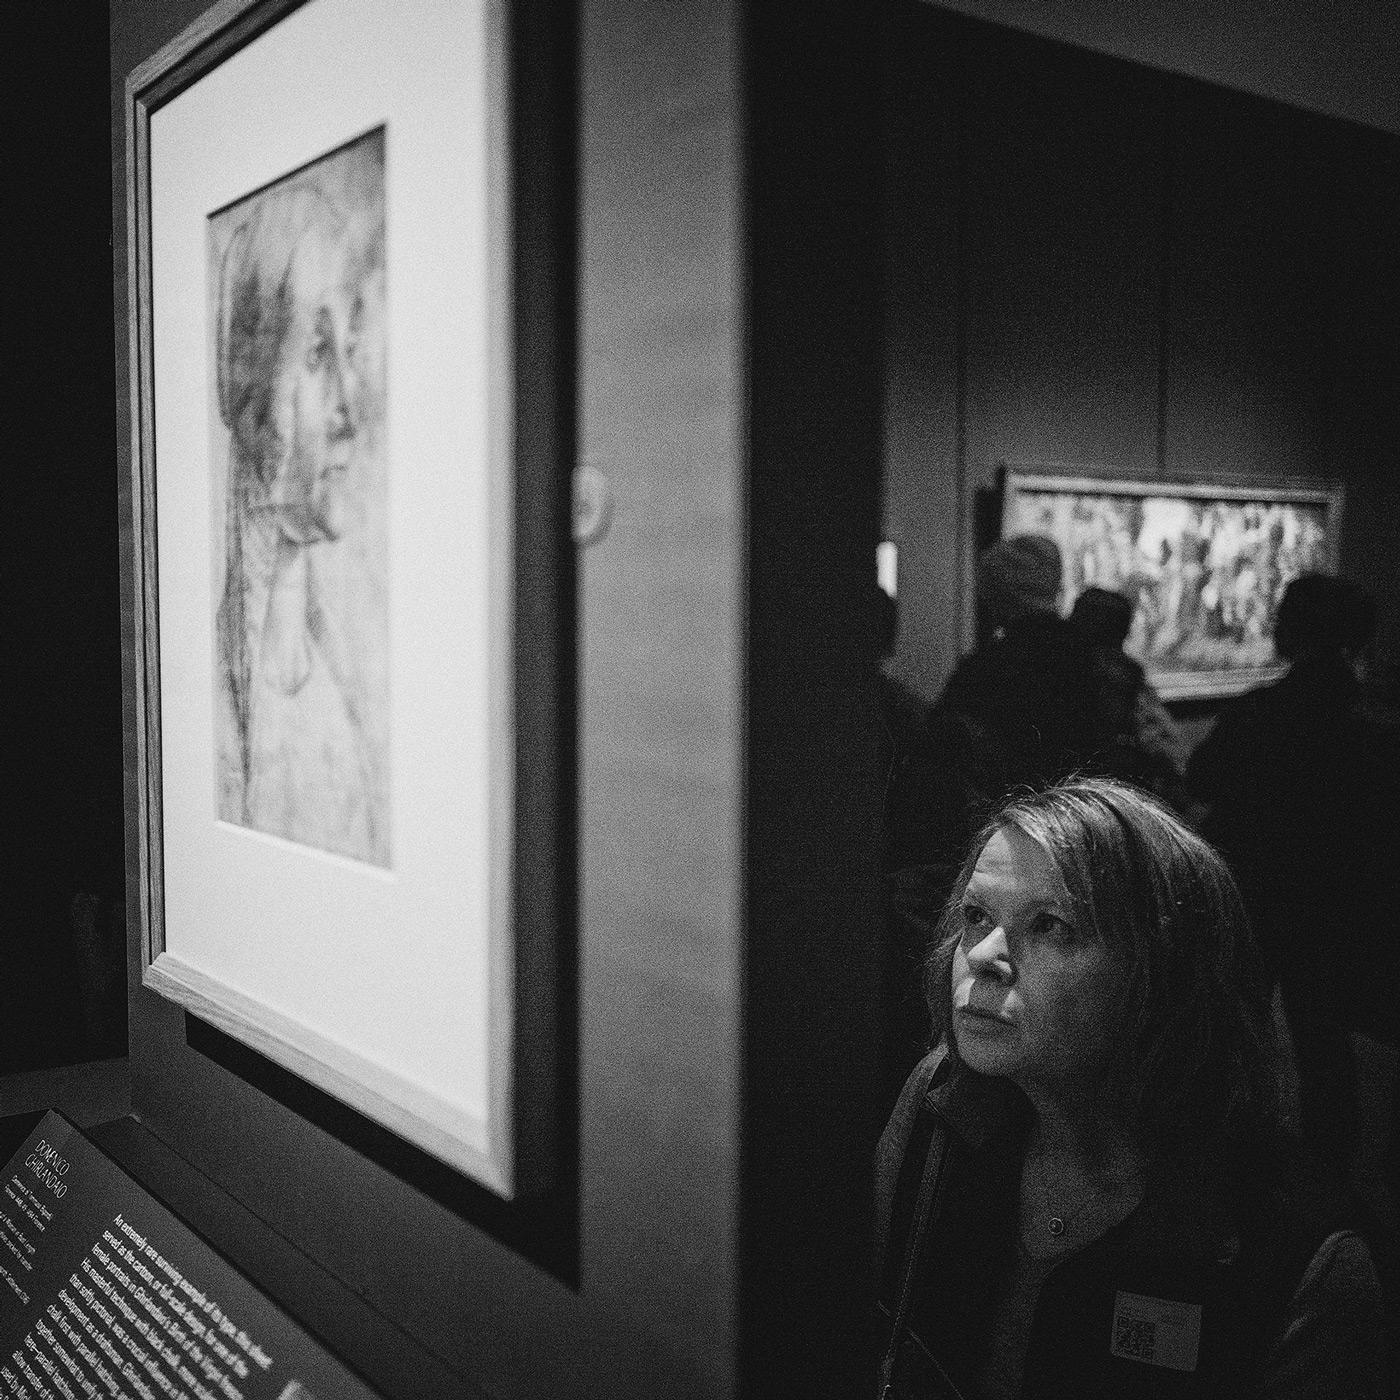 William-Bullard_USA_Pictures-at-an-Exhibition_12.jpeg